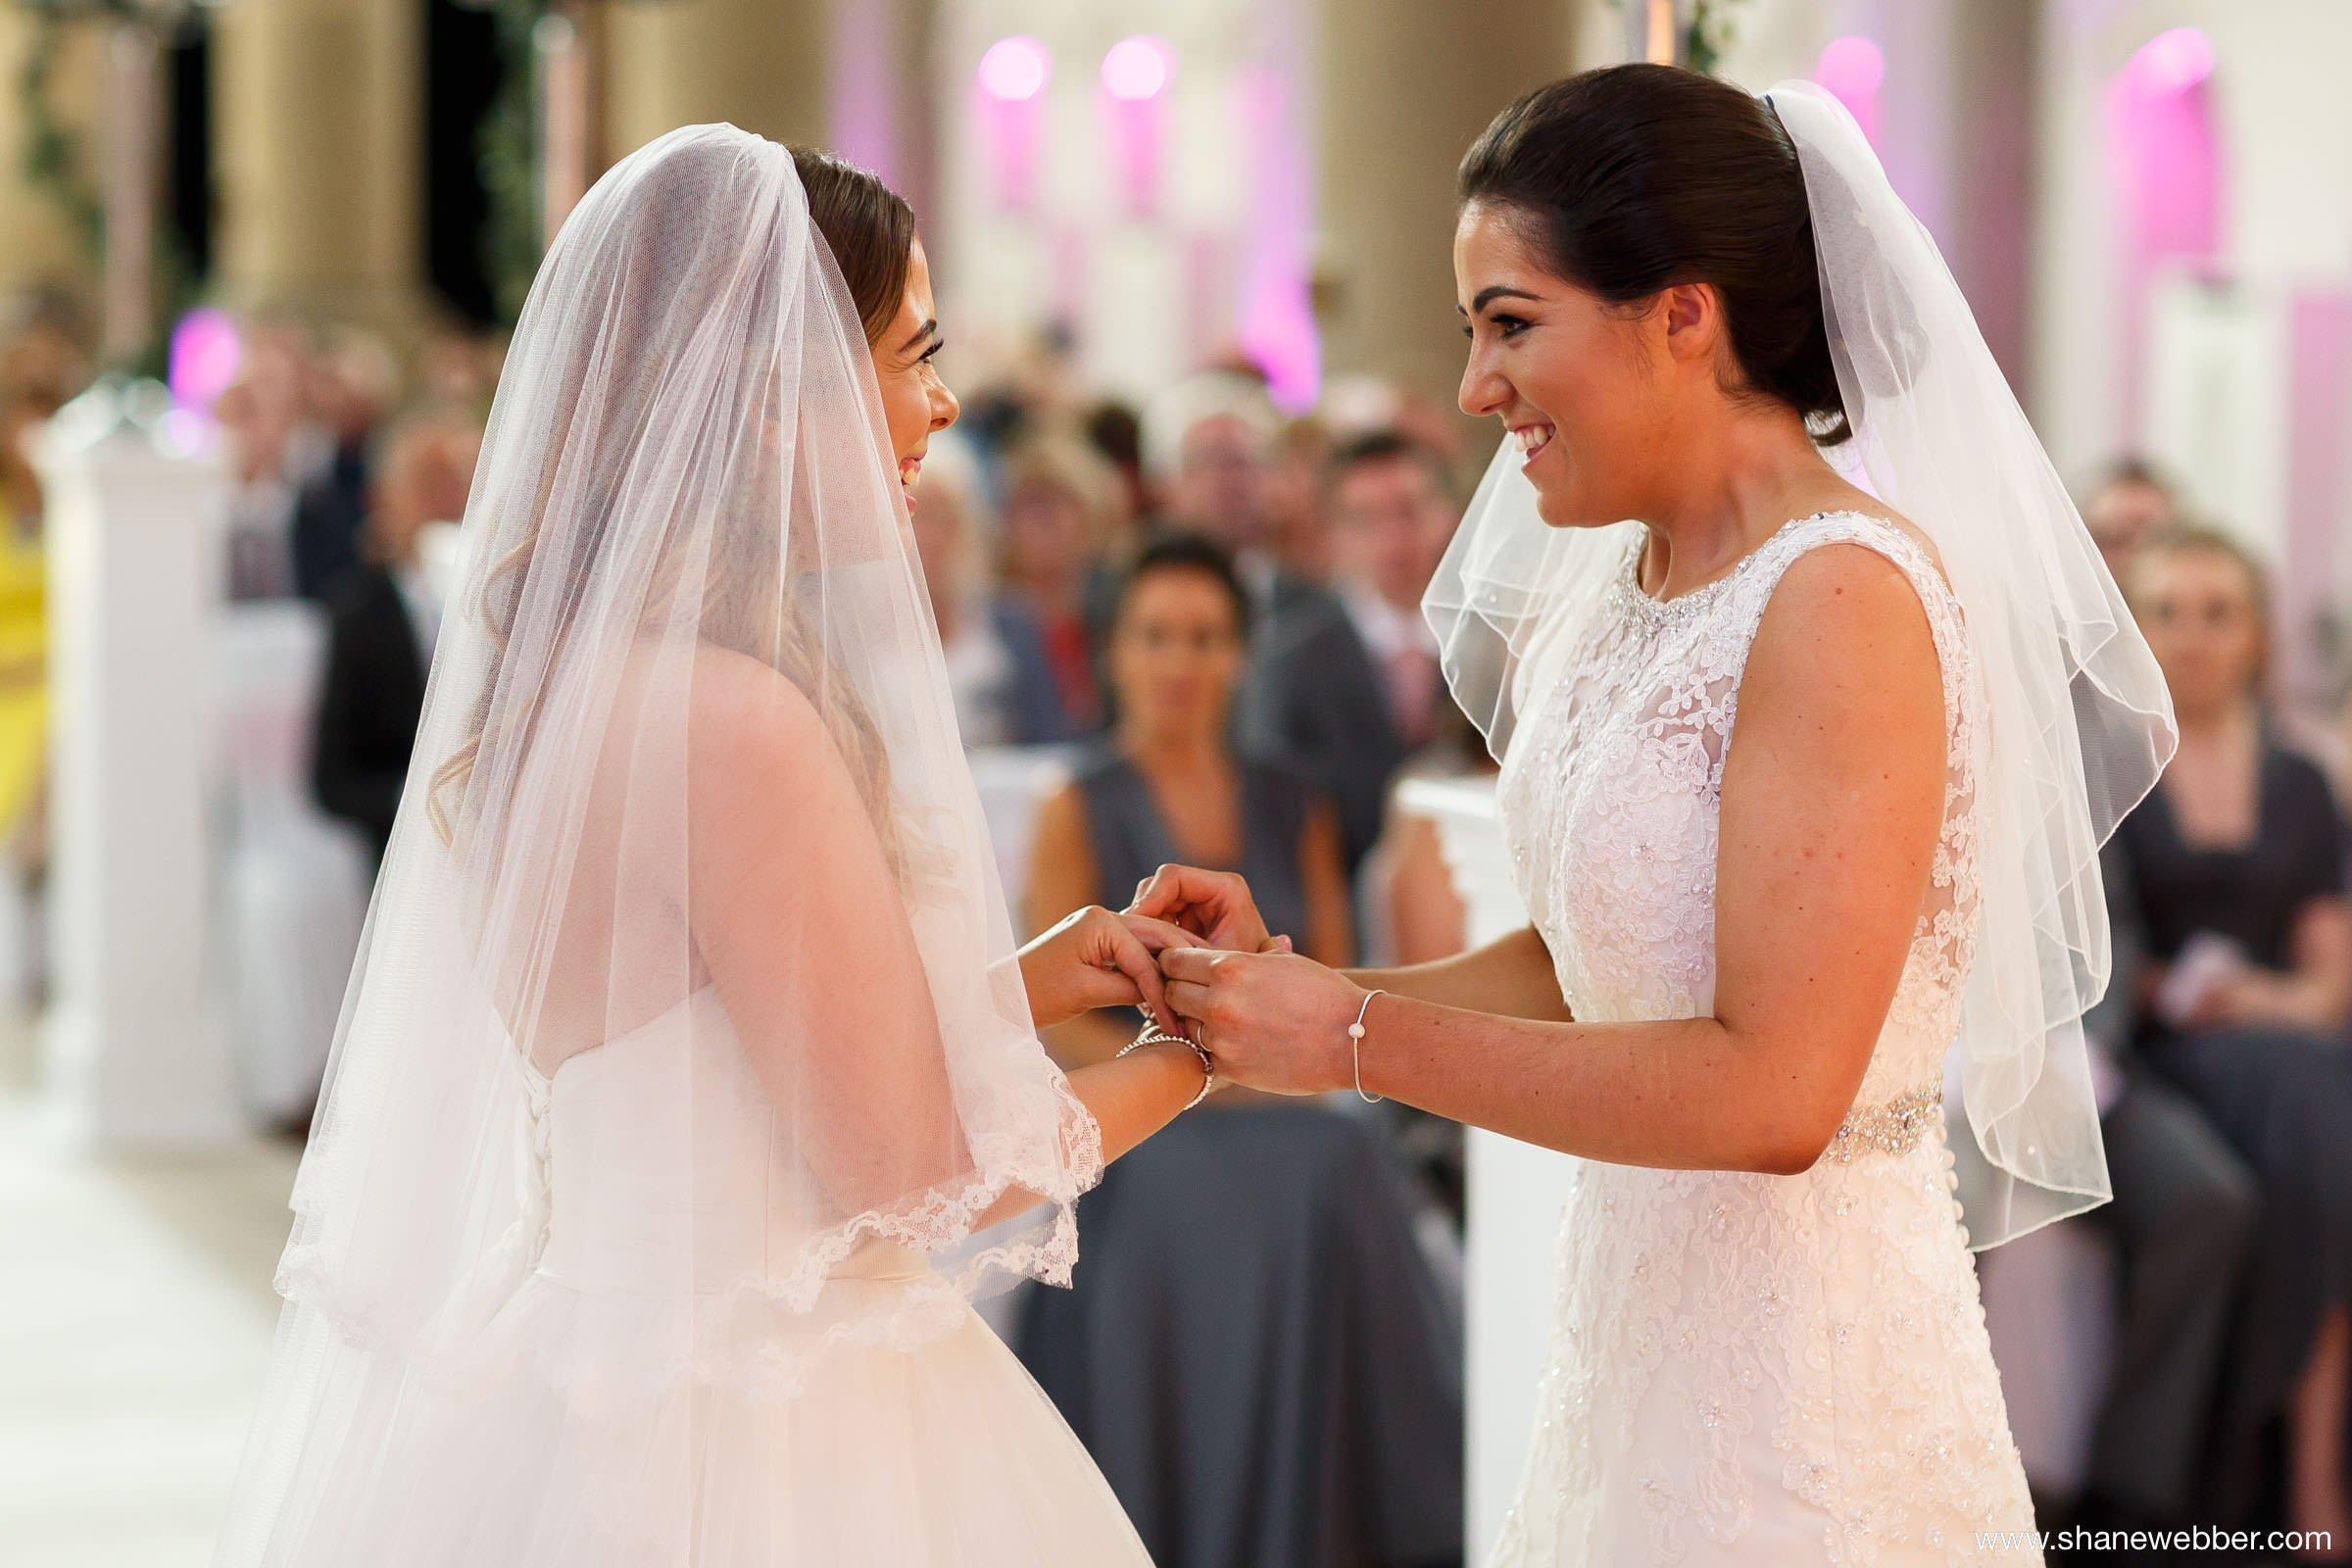 Same sex wedding ceremonies